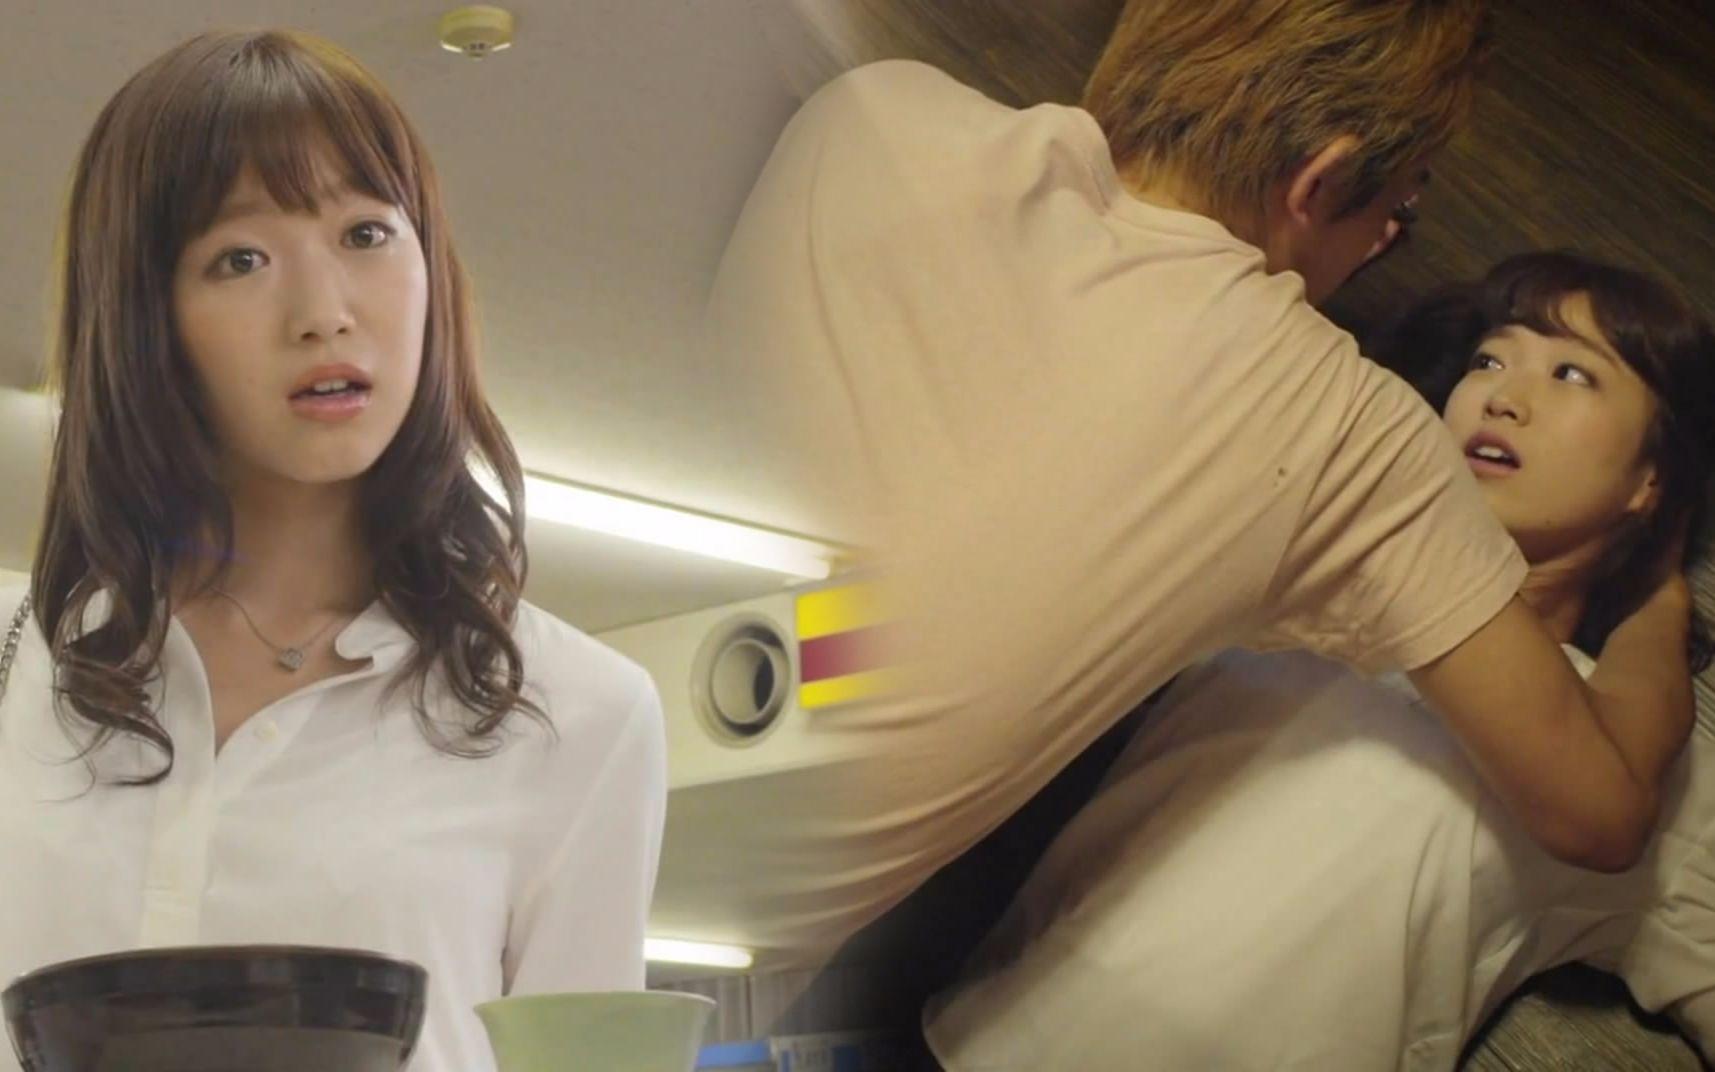 rihantoukuidianying_【我来说电影】1分钟看完《偷窥情人》 日本限制级大尺度 青春爱情